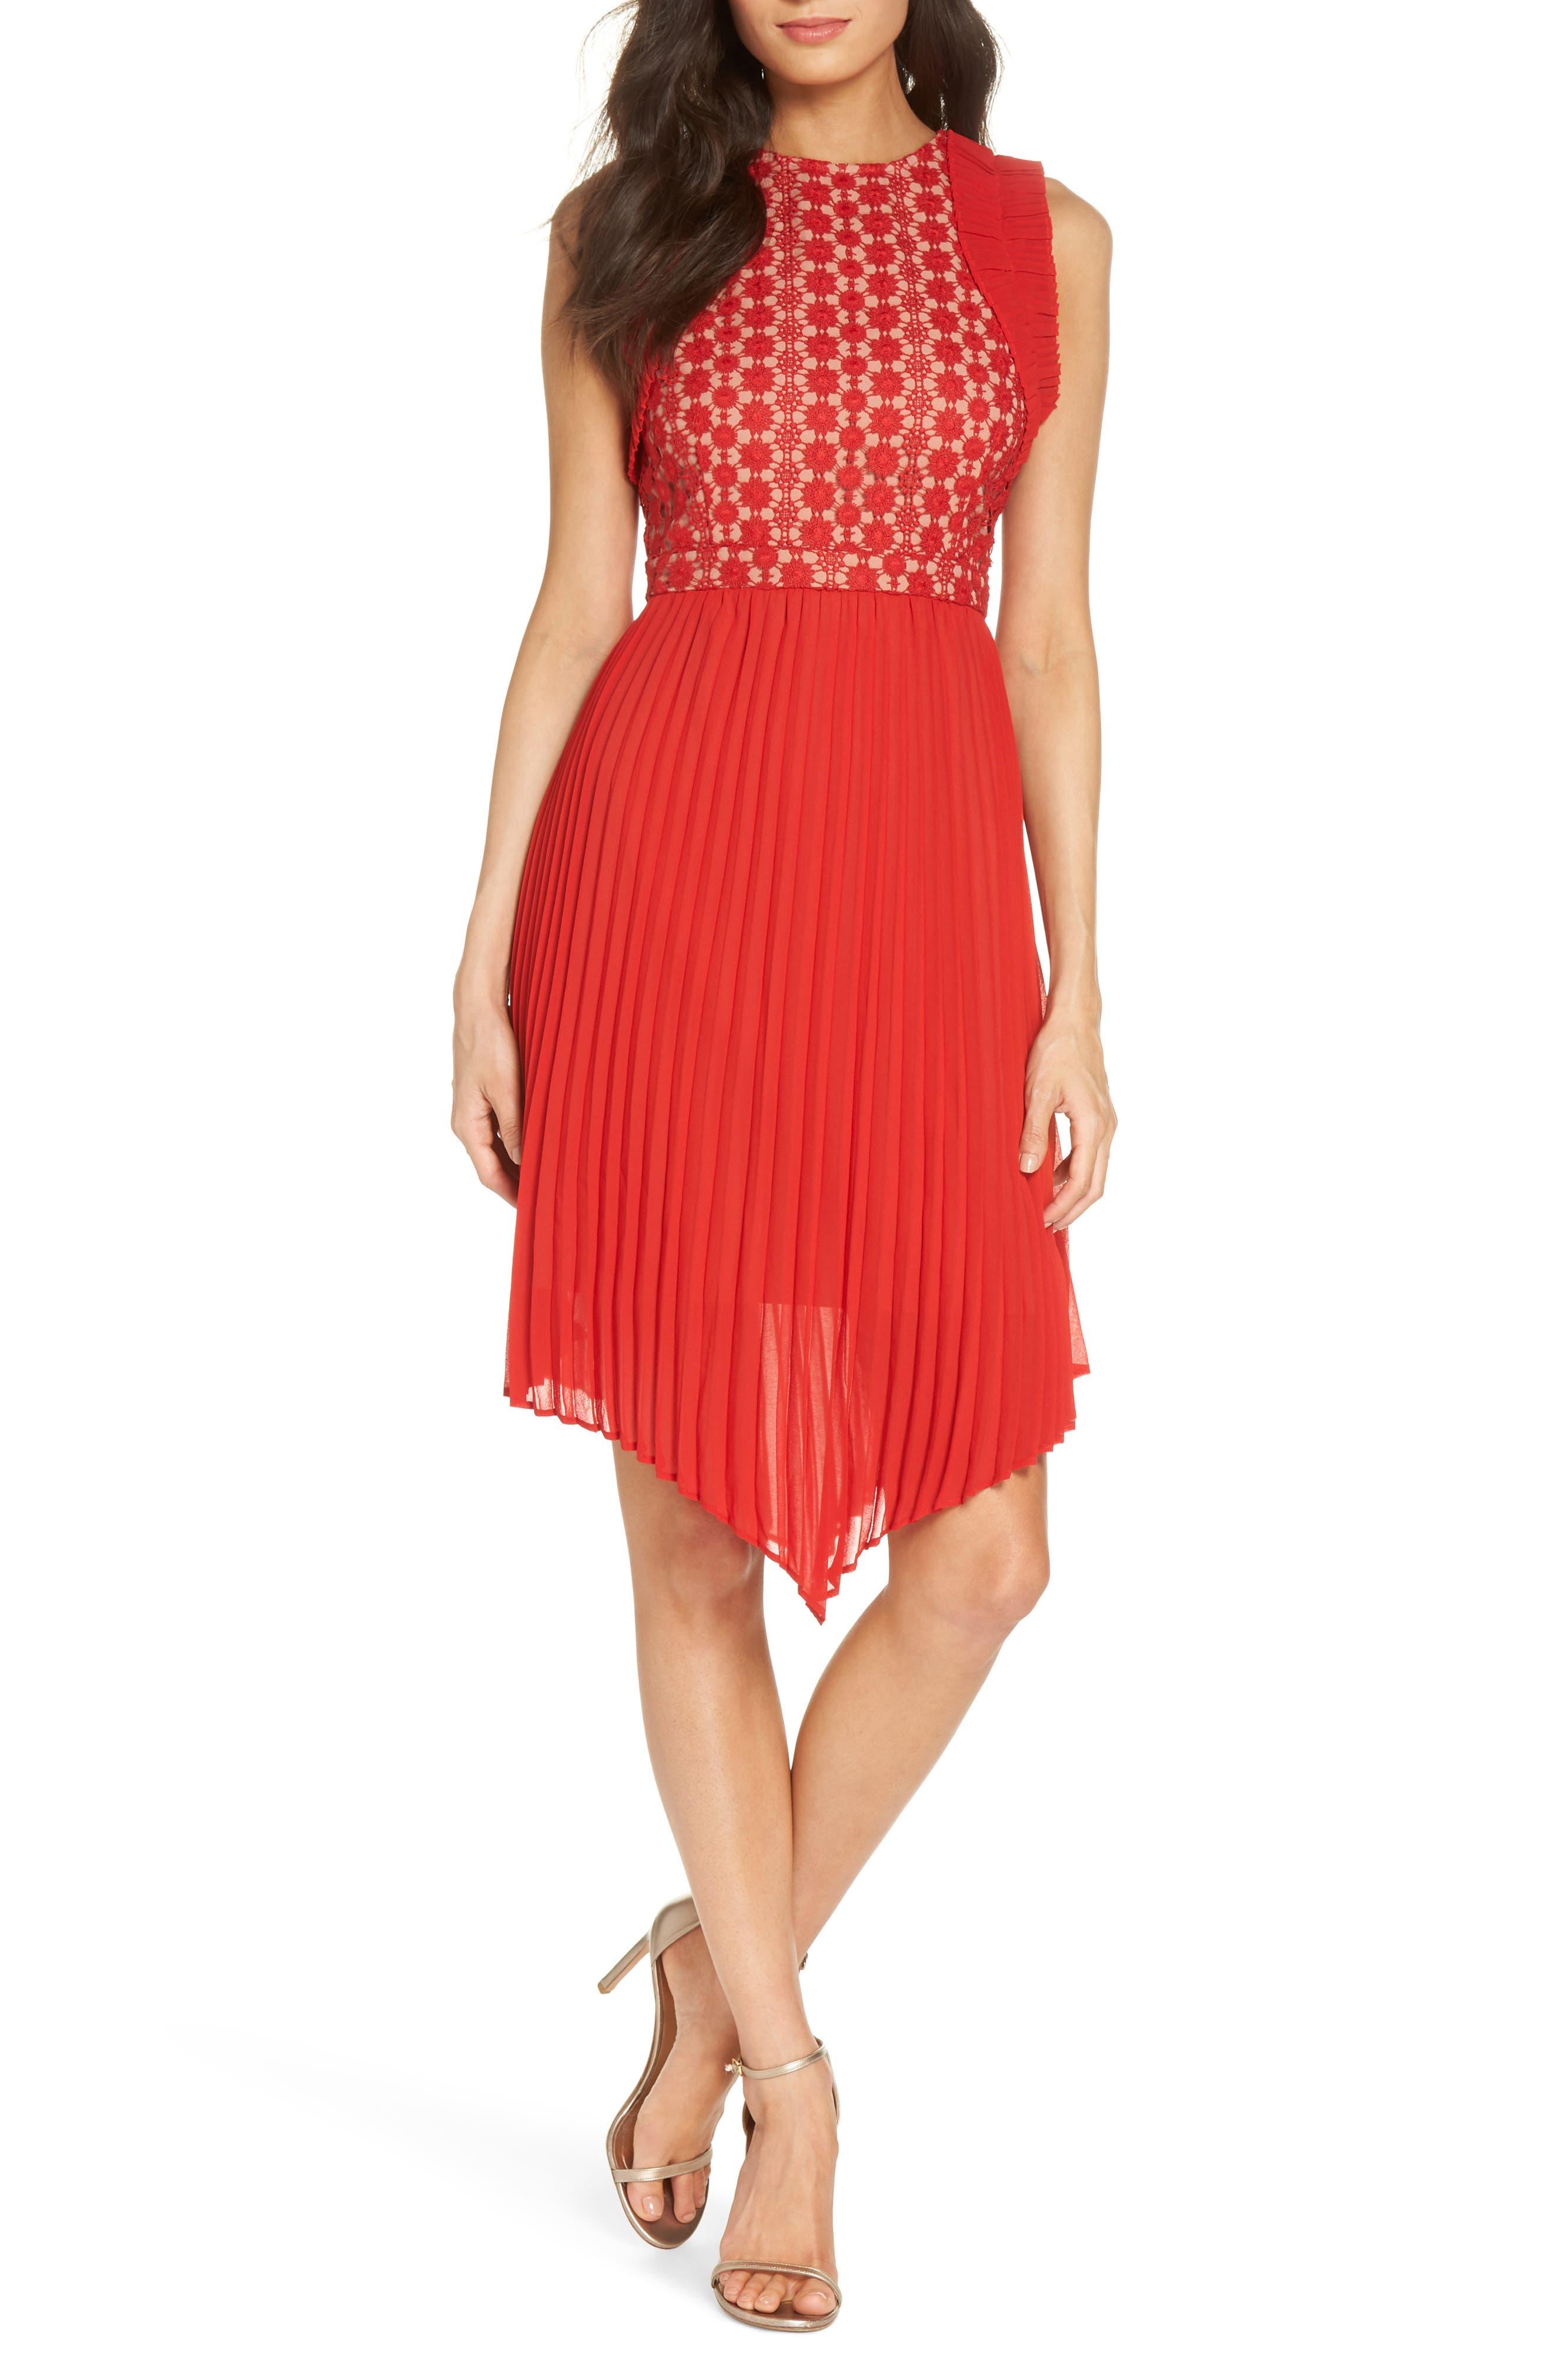 Nealea Pleated Sheath Dress,                         Main,                         color, Red